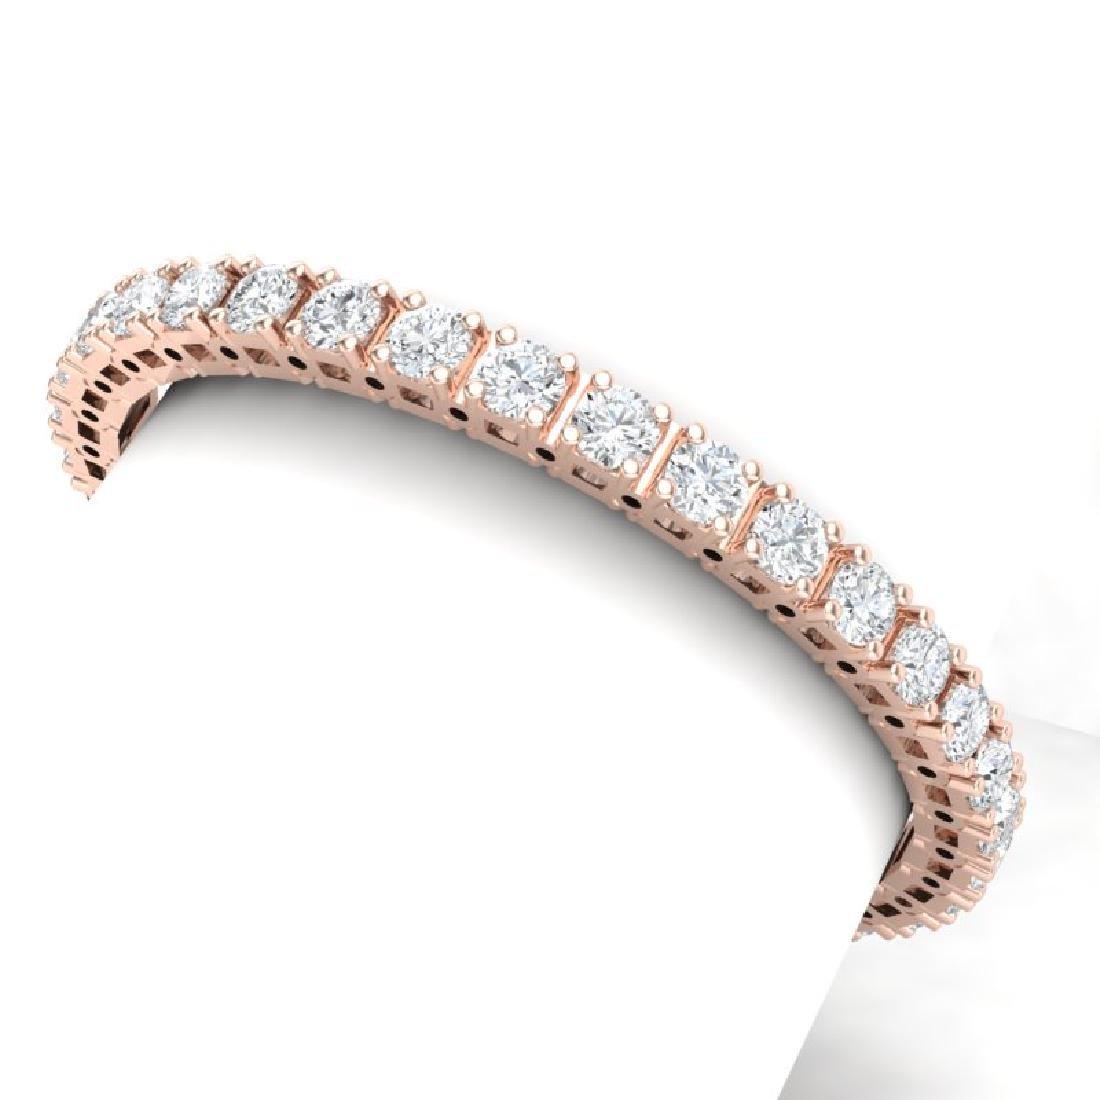 20 CTW Certified SI Diamond Bracelet 18K Rose Gold